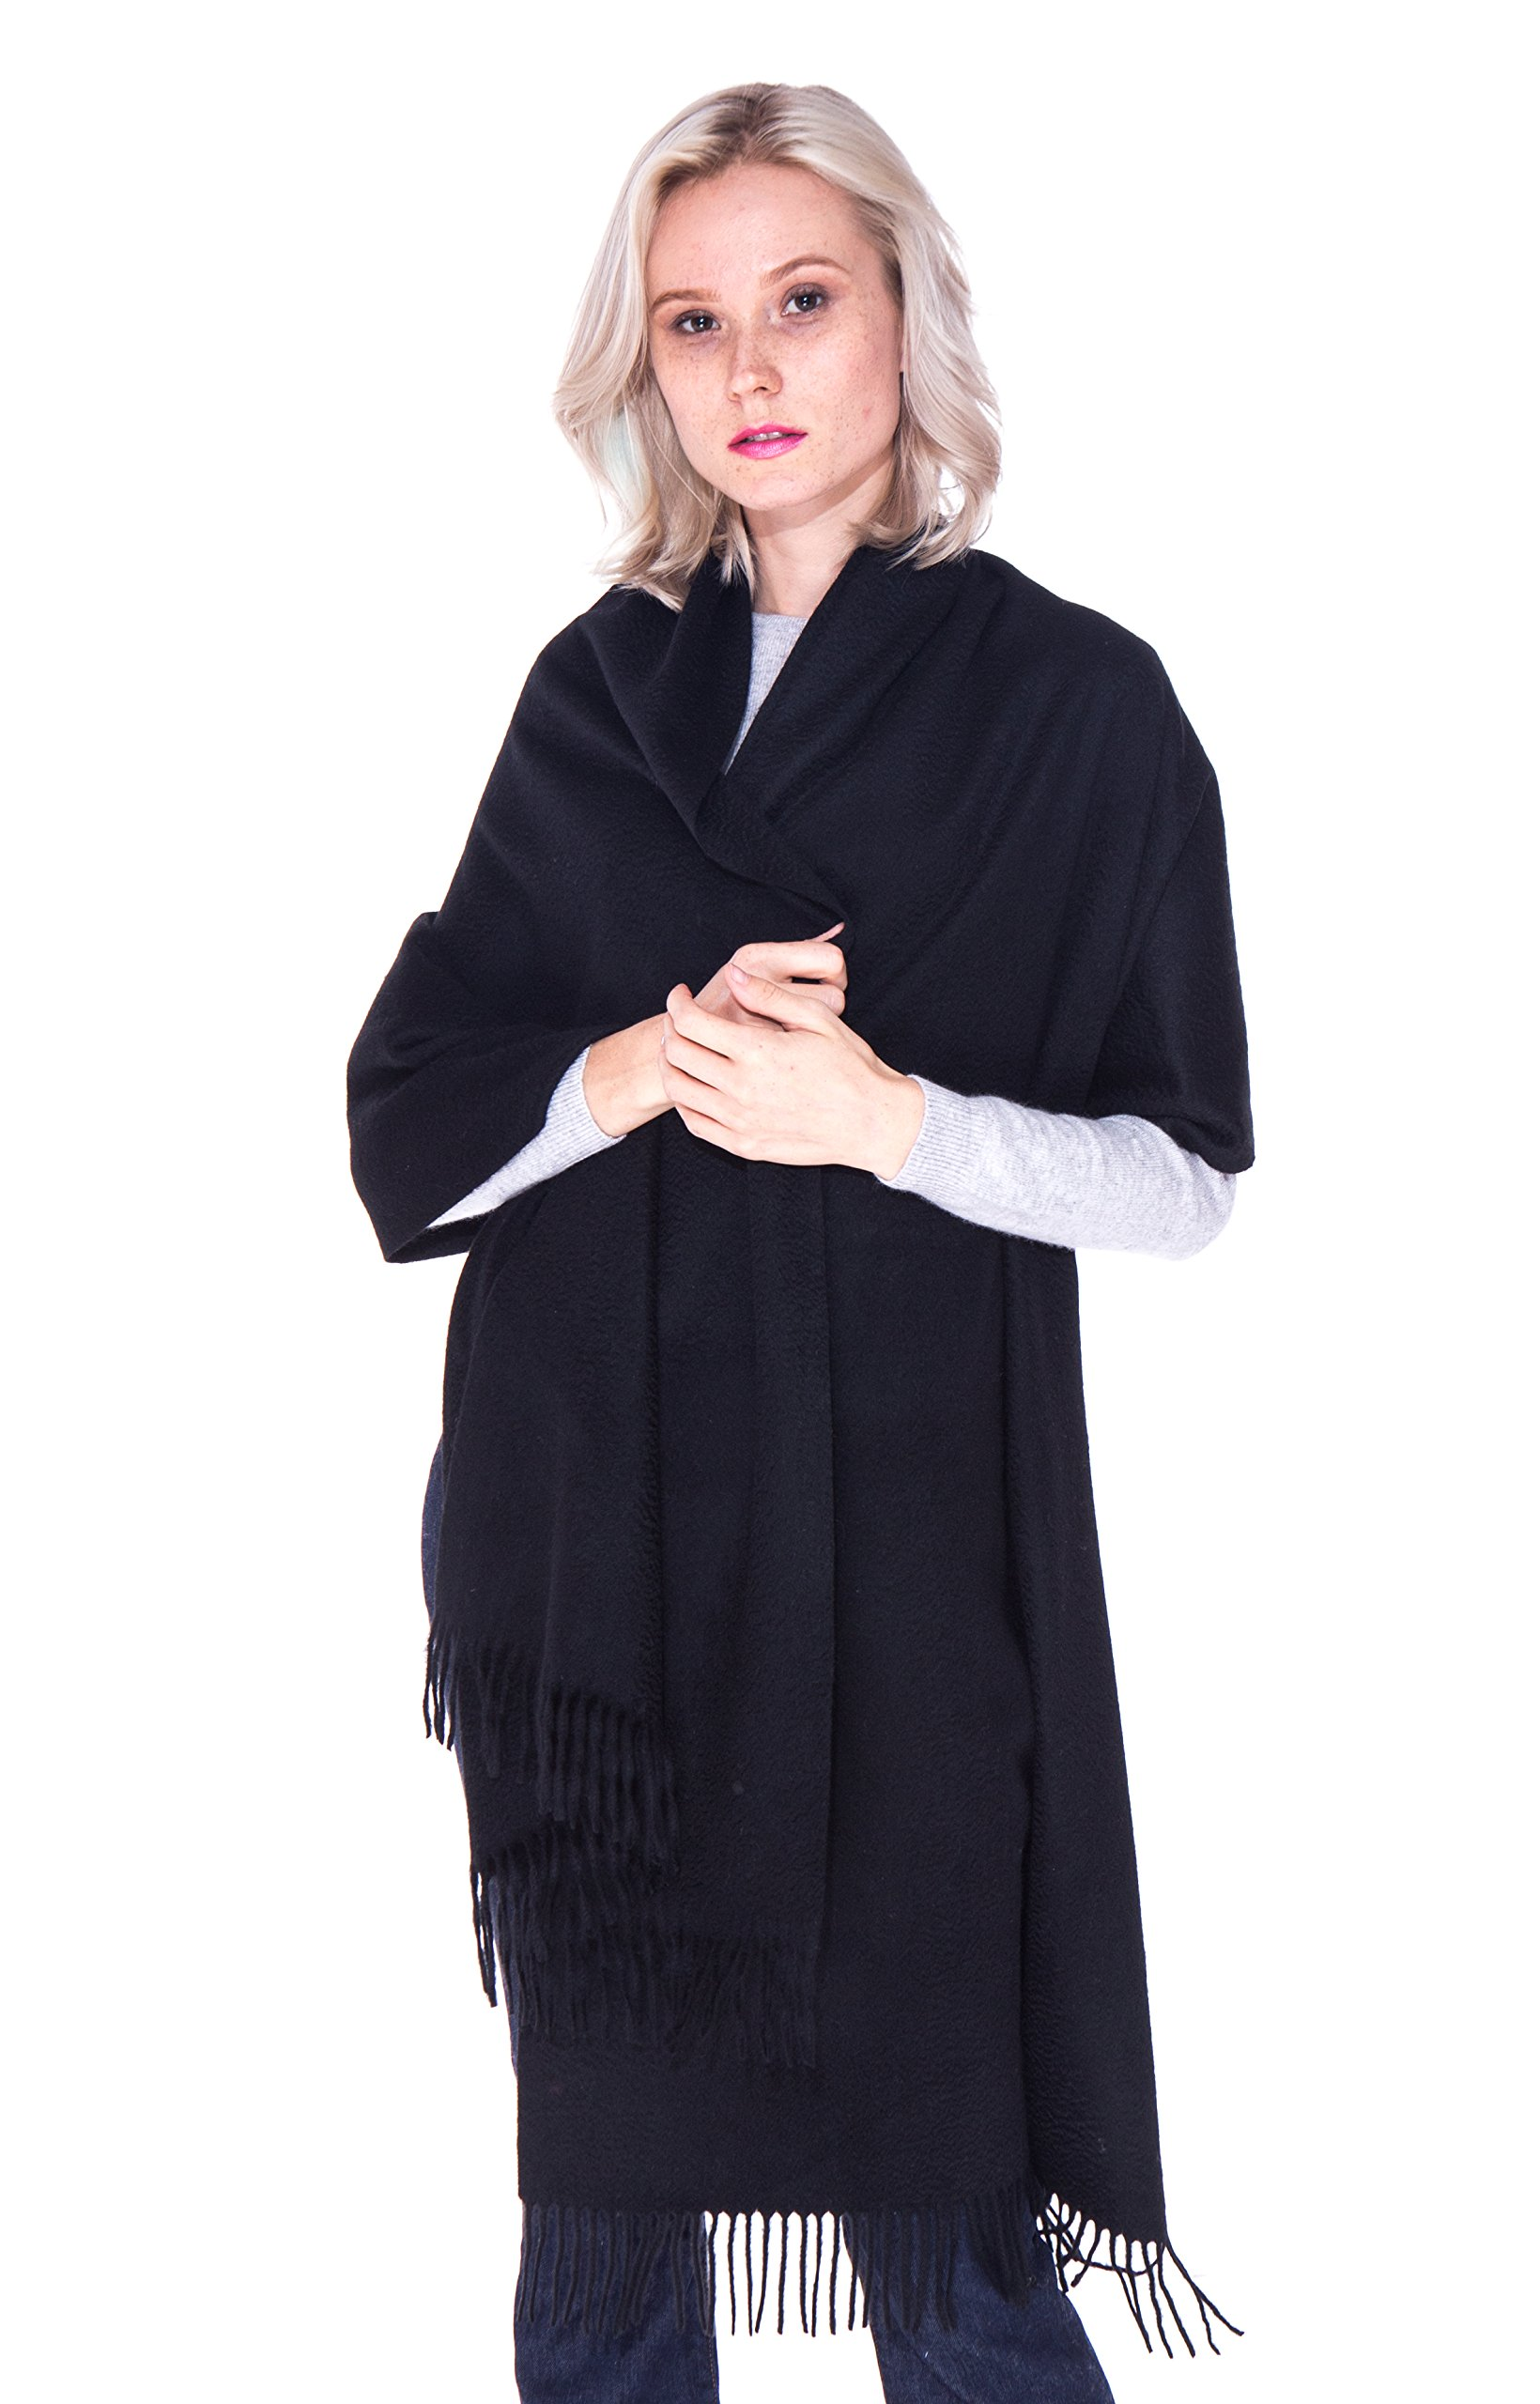 LEBAC 100% Cashmere Wrap Shawl Stole With Fringes - Extra Large Super Warm by LEBAC